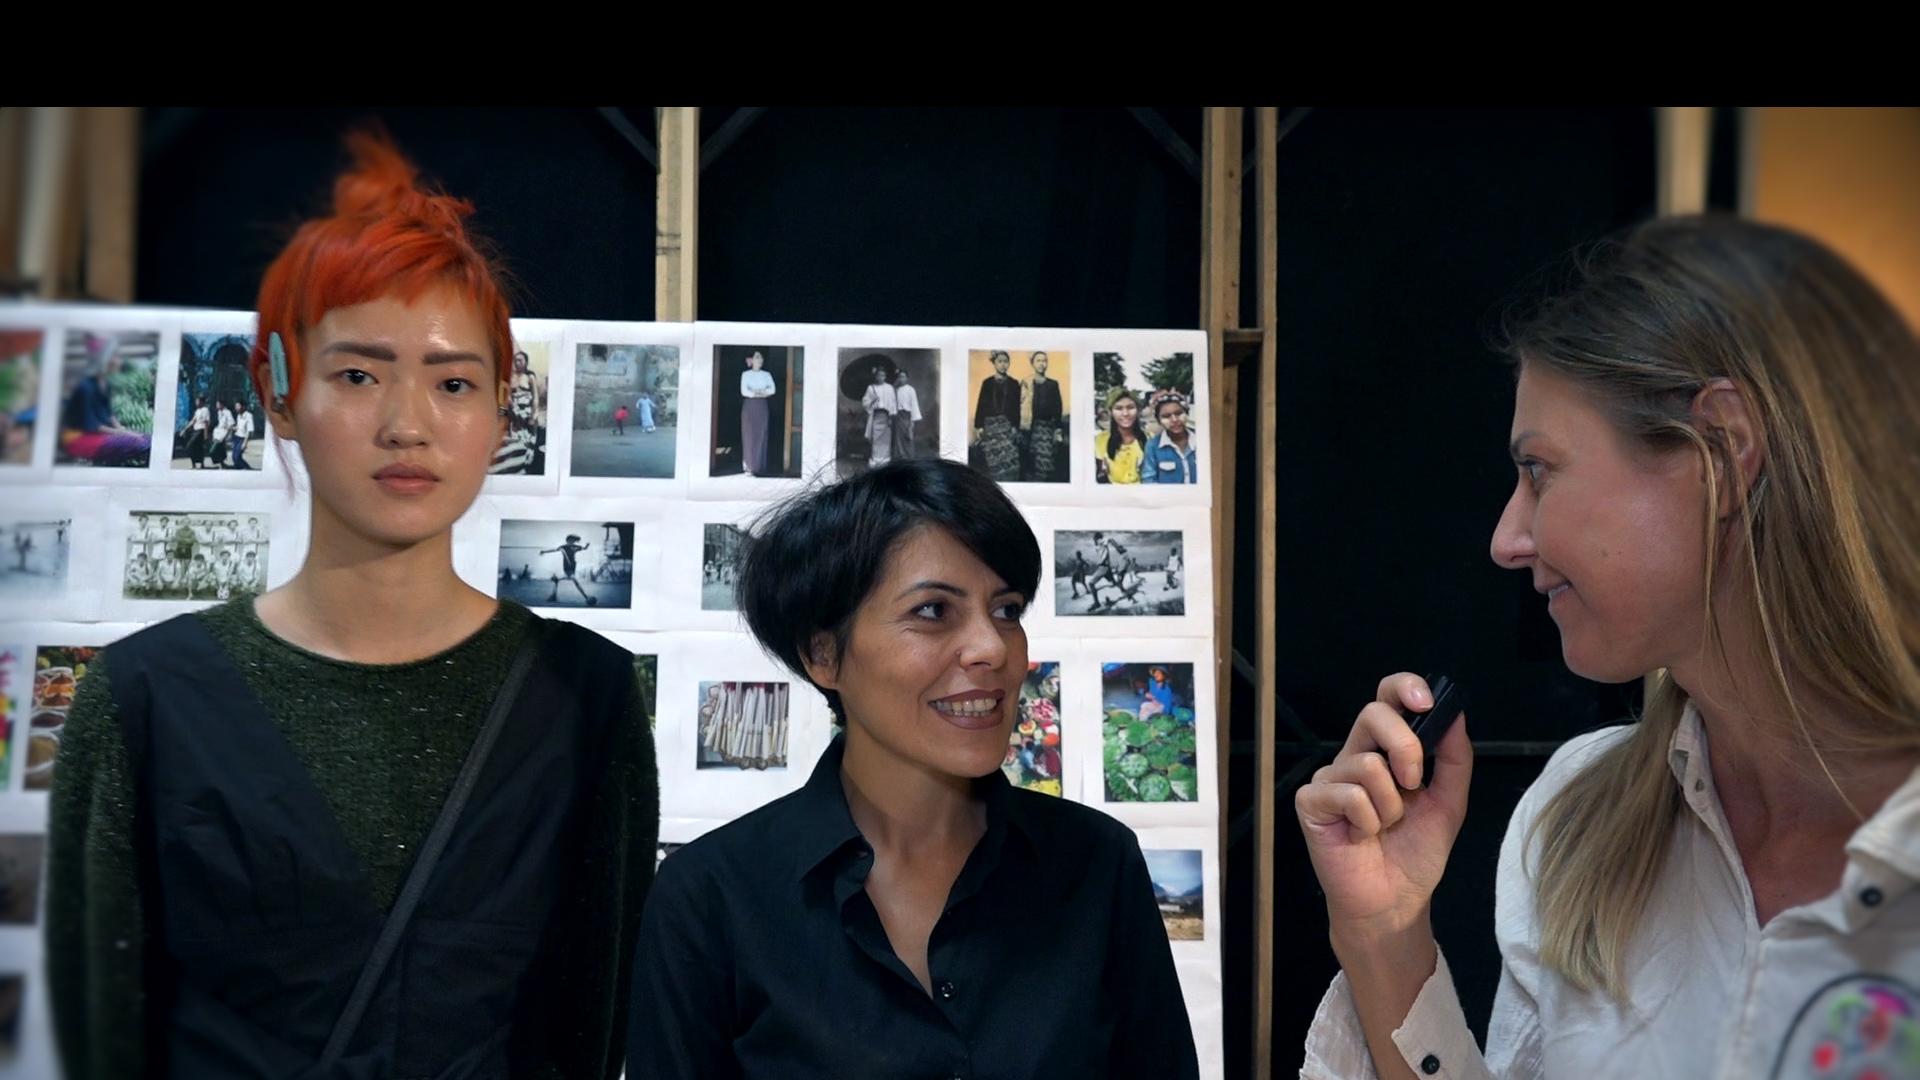 Unghie basic, effetto shine. Intervista a Paola Sacripante di nails&beauty